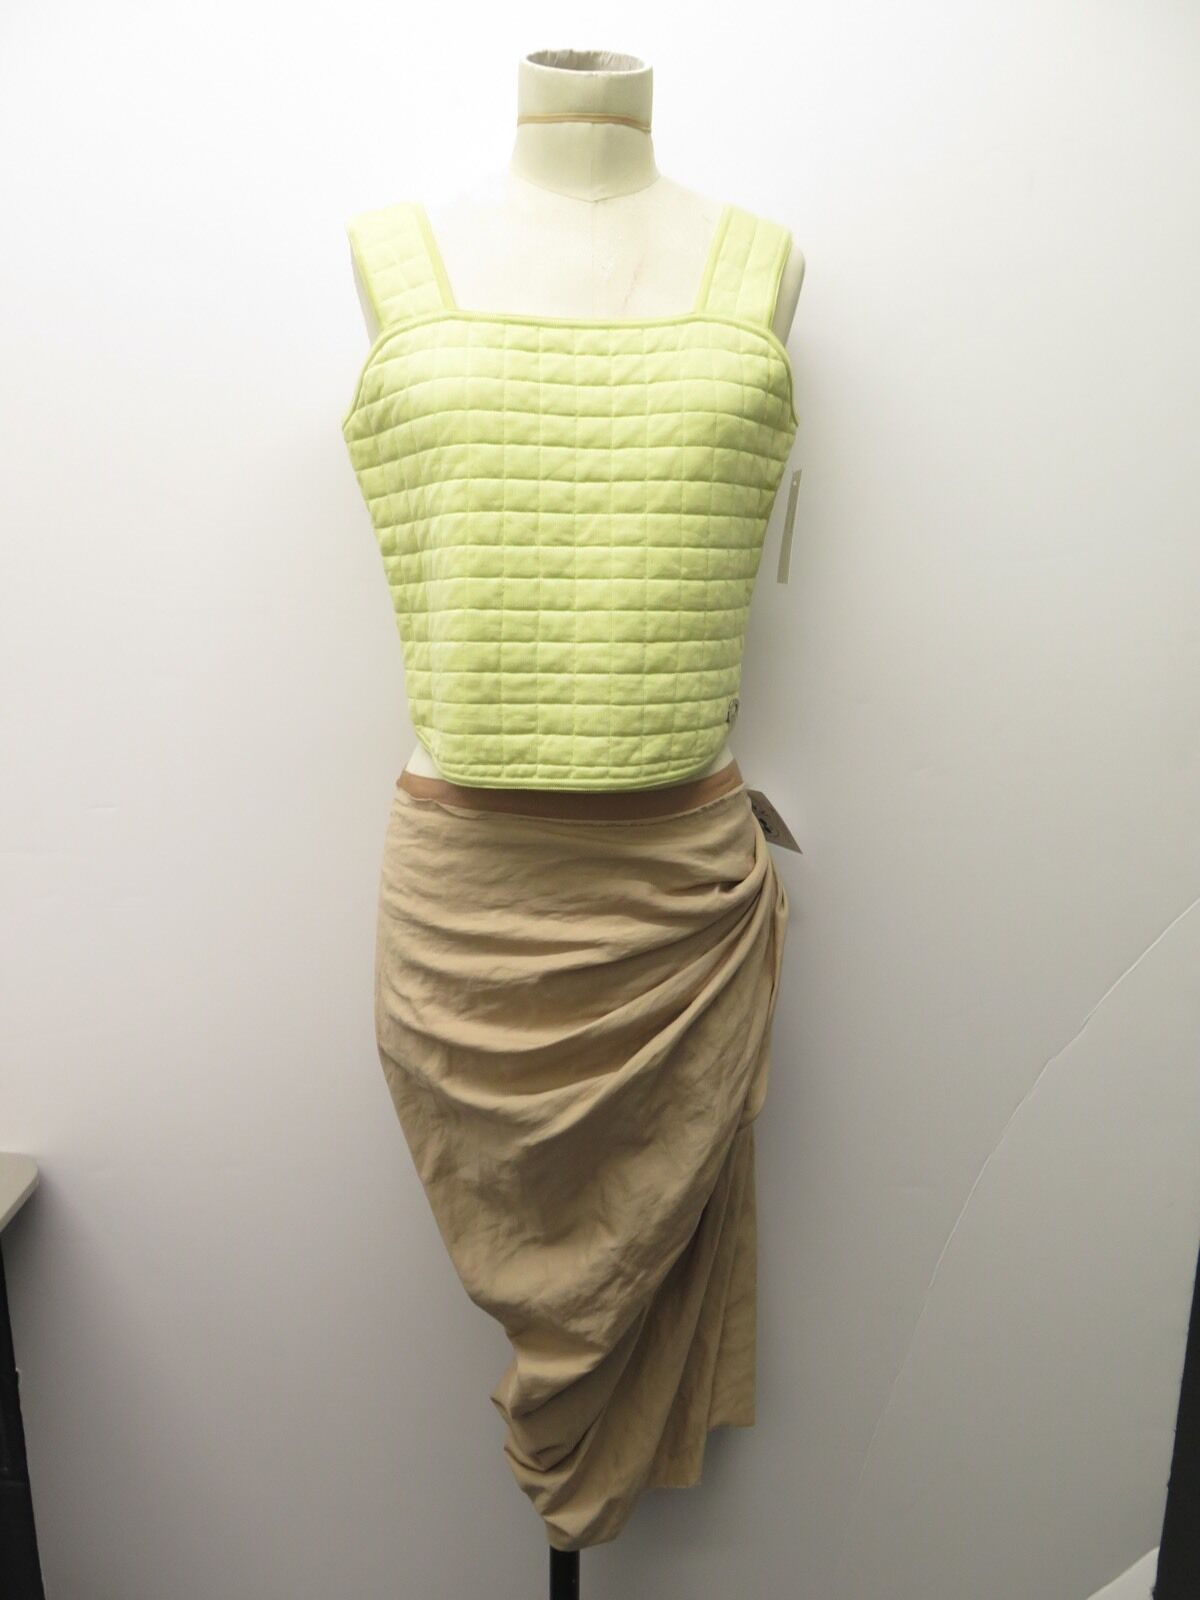 561716637 Lanvin 2009 Beige Cotton Blend Drape Sz 42 Skirt Spring nfstnd10906 ...